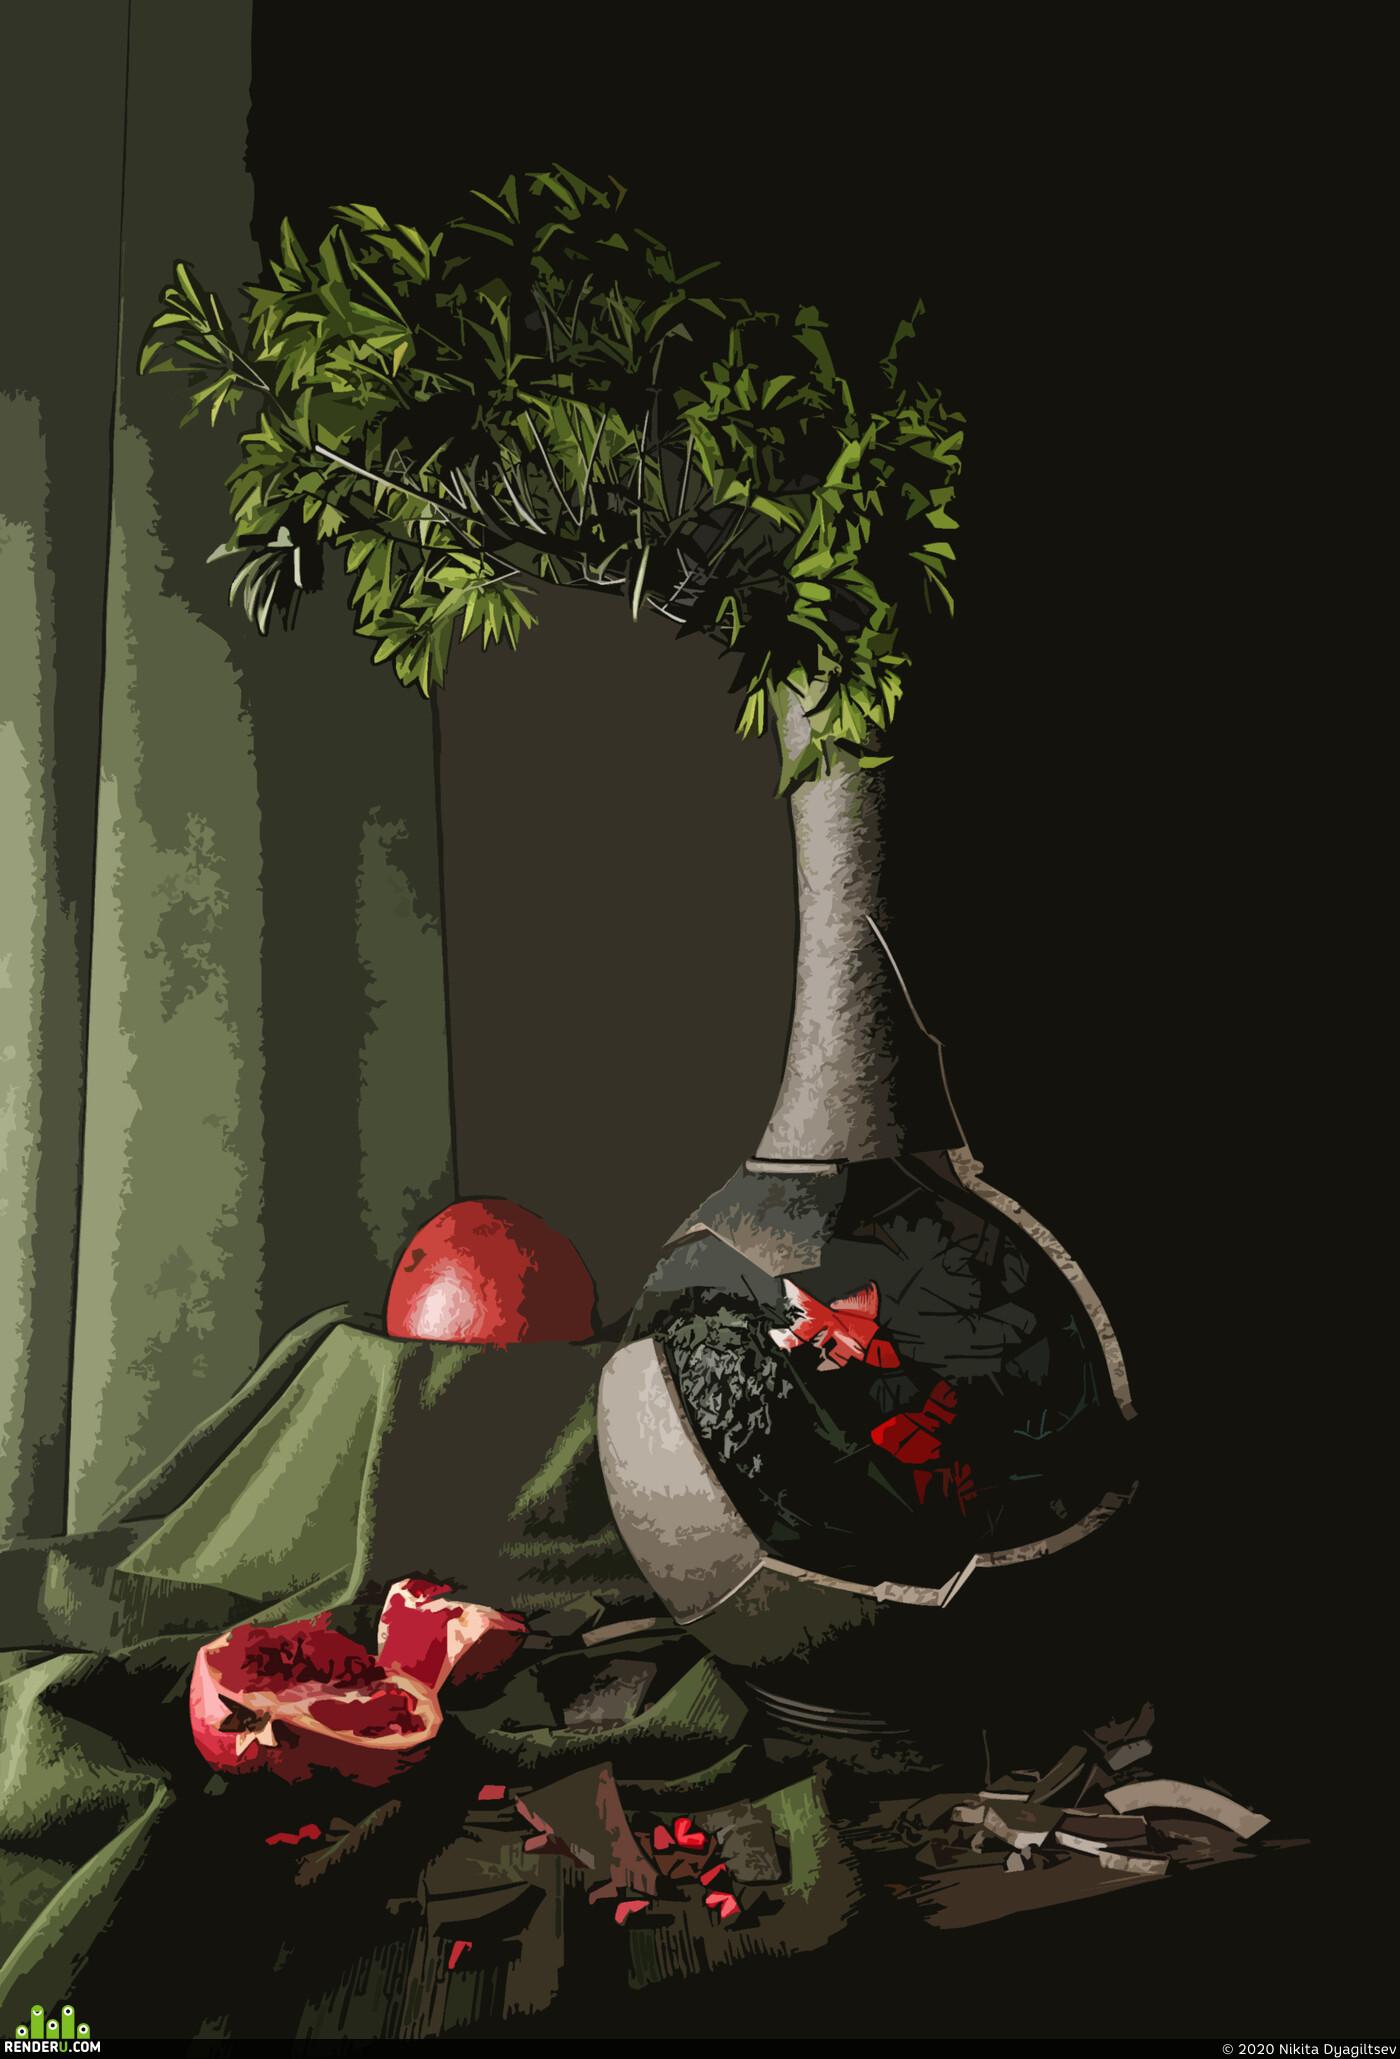 Натюрморт, still-life, Corona Renderer, 3ds Max, photorealism, Сюрреализм, мистика